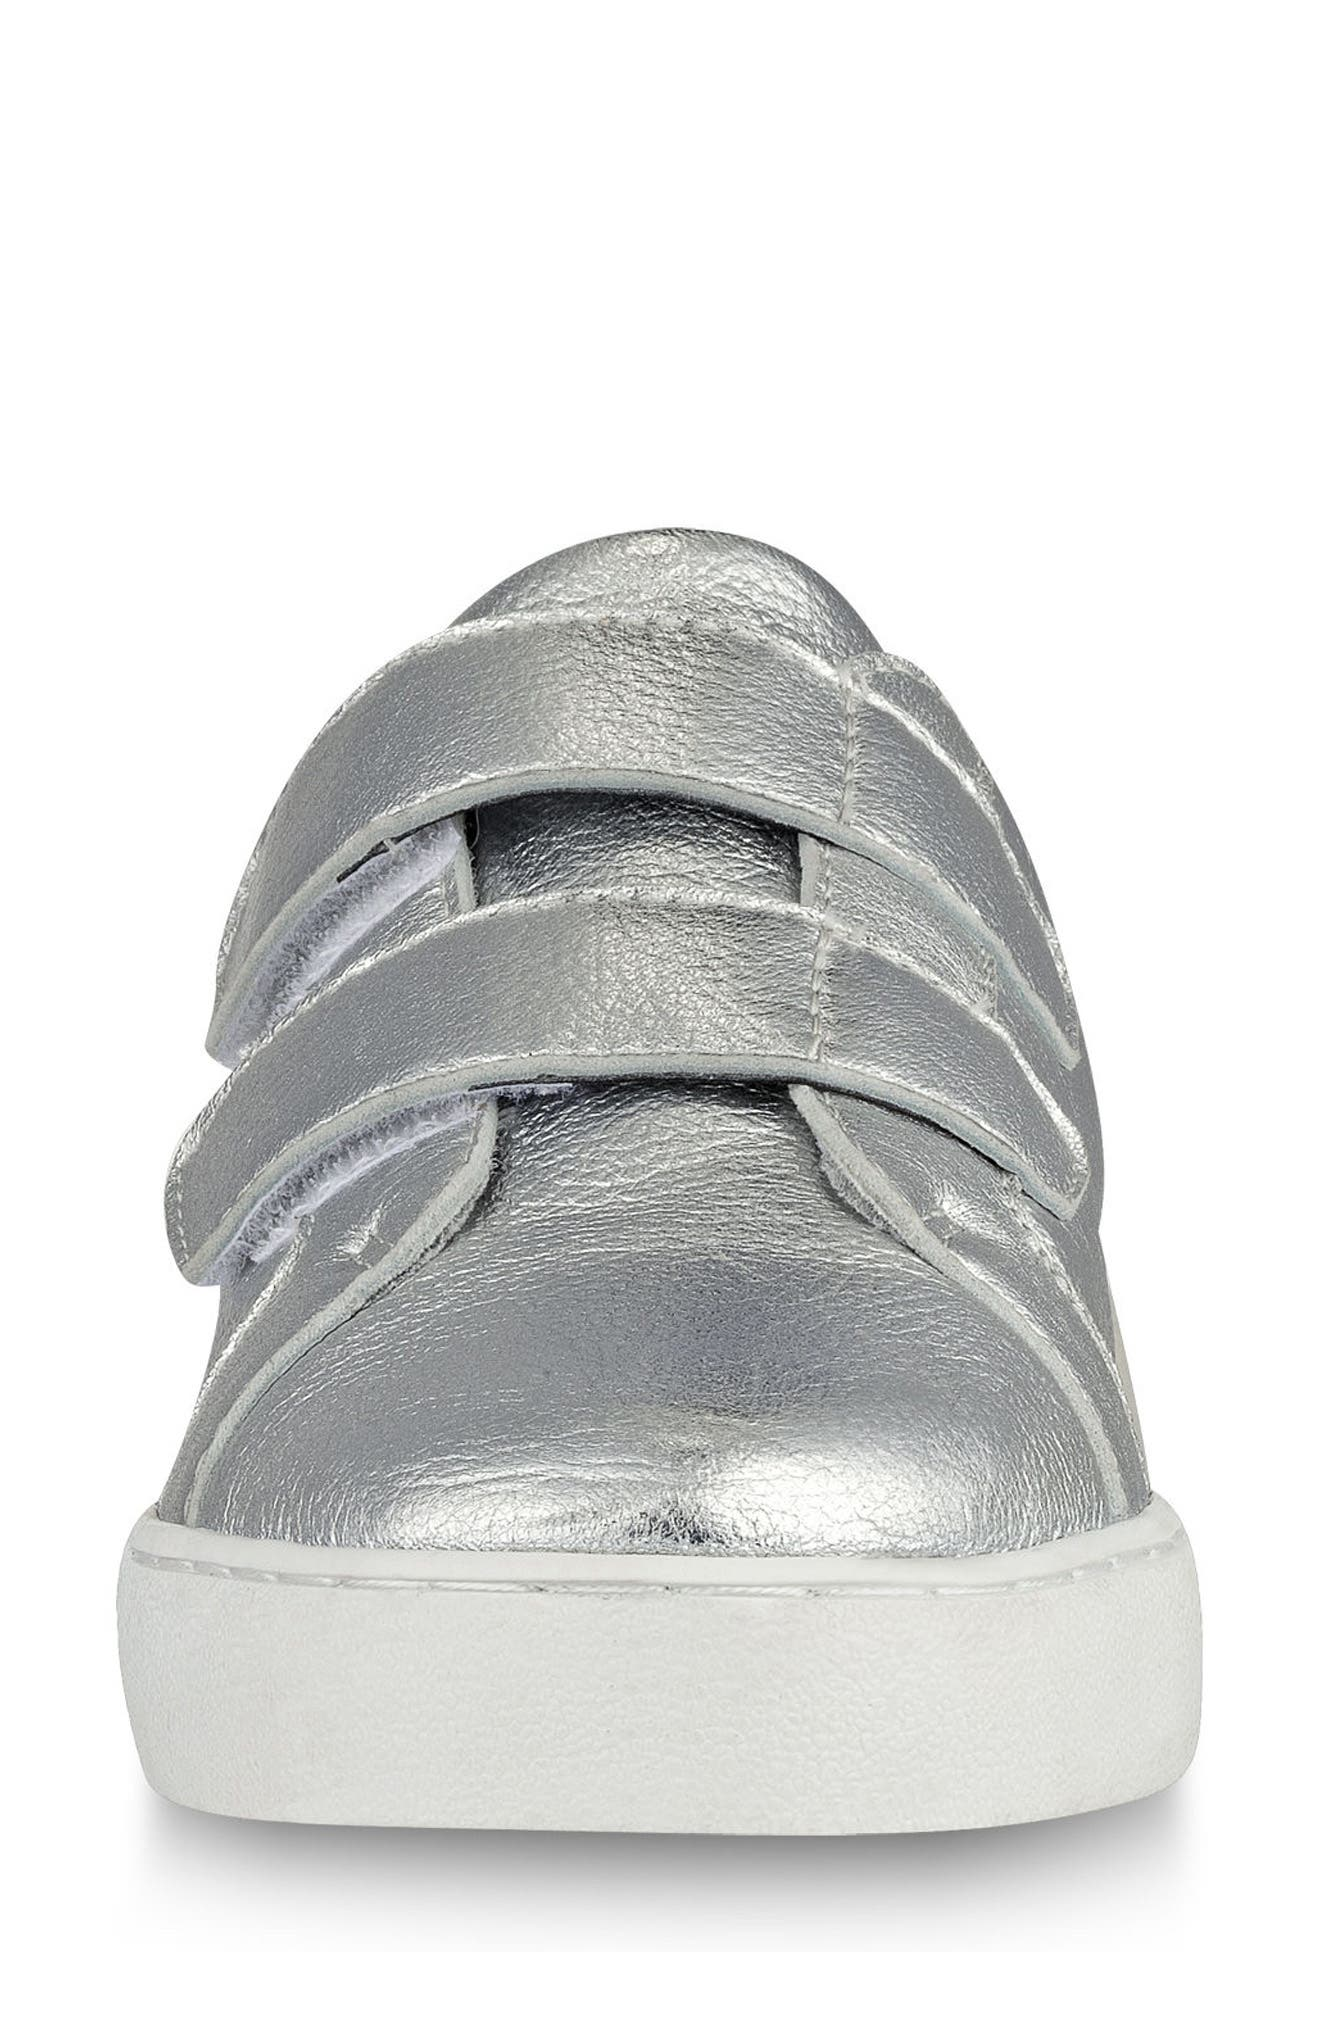 Poeton Sneaker Mule,                             Alternate thumbnail 7, color,